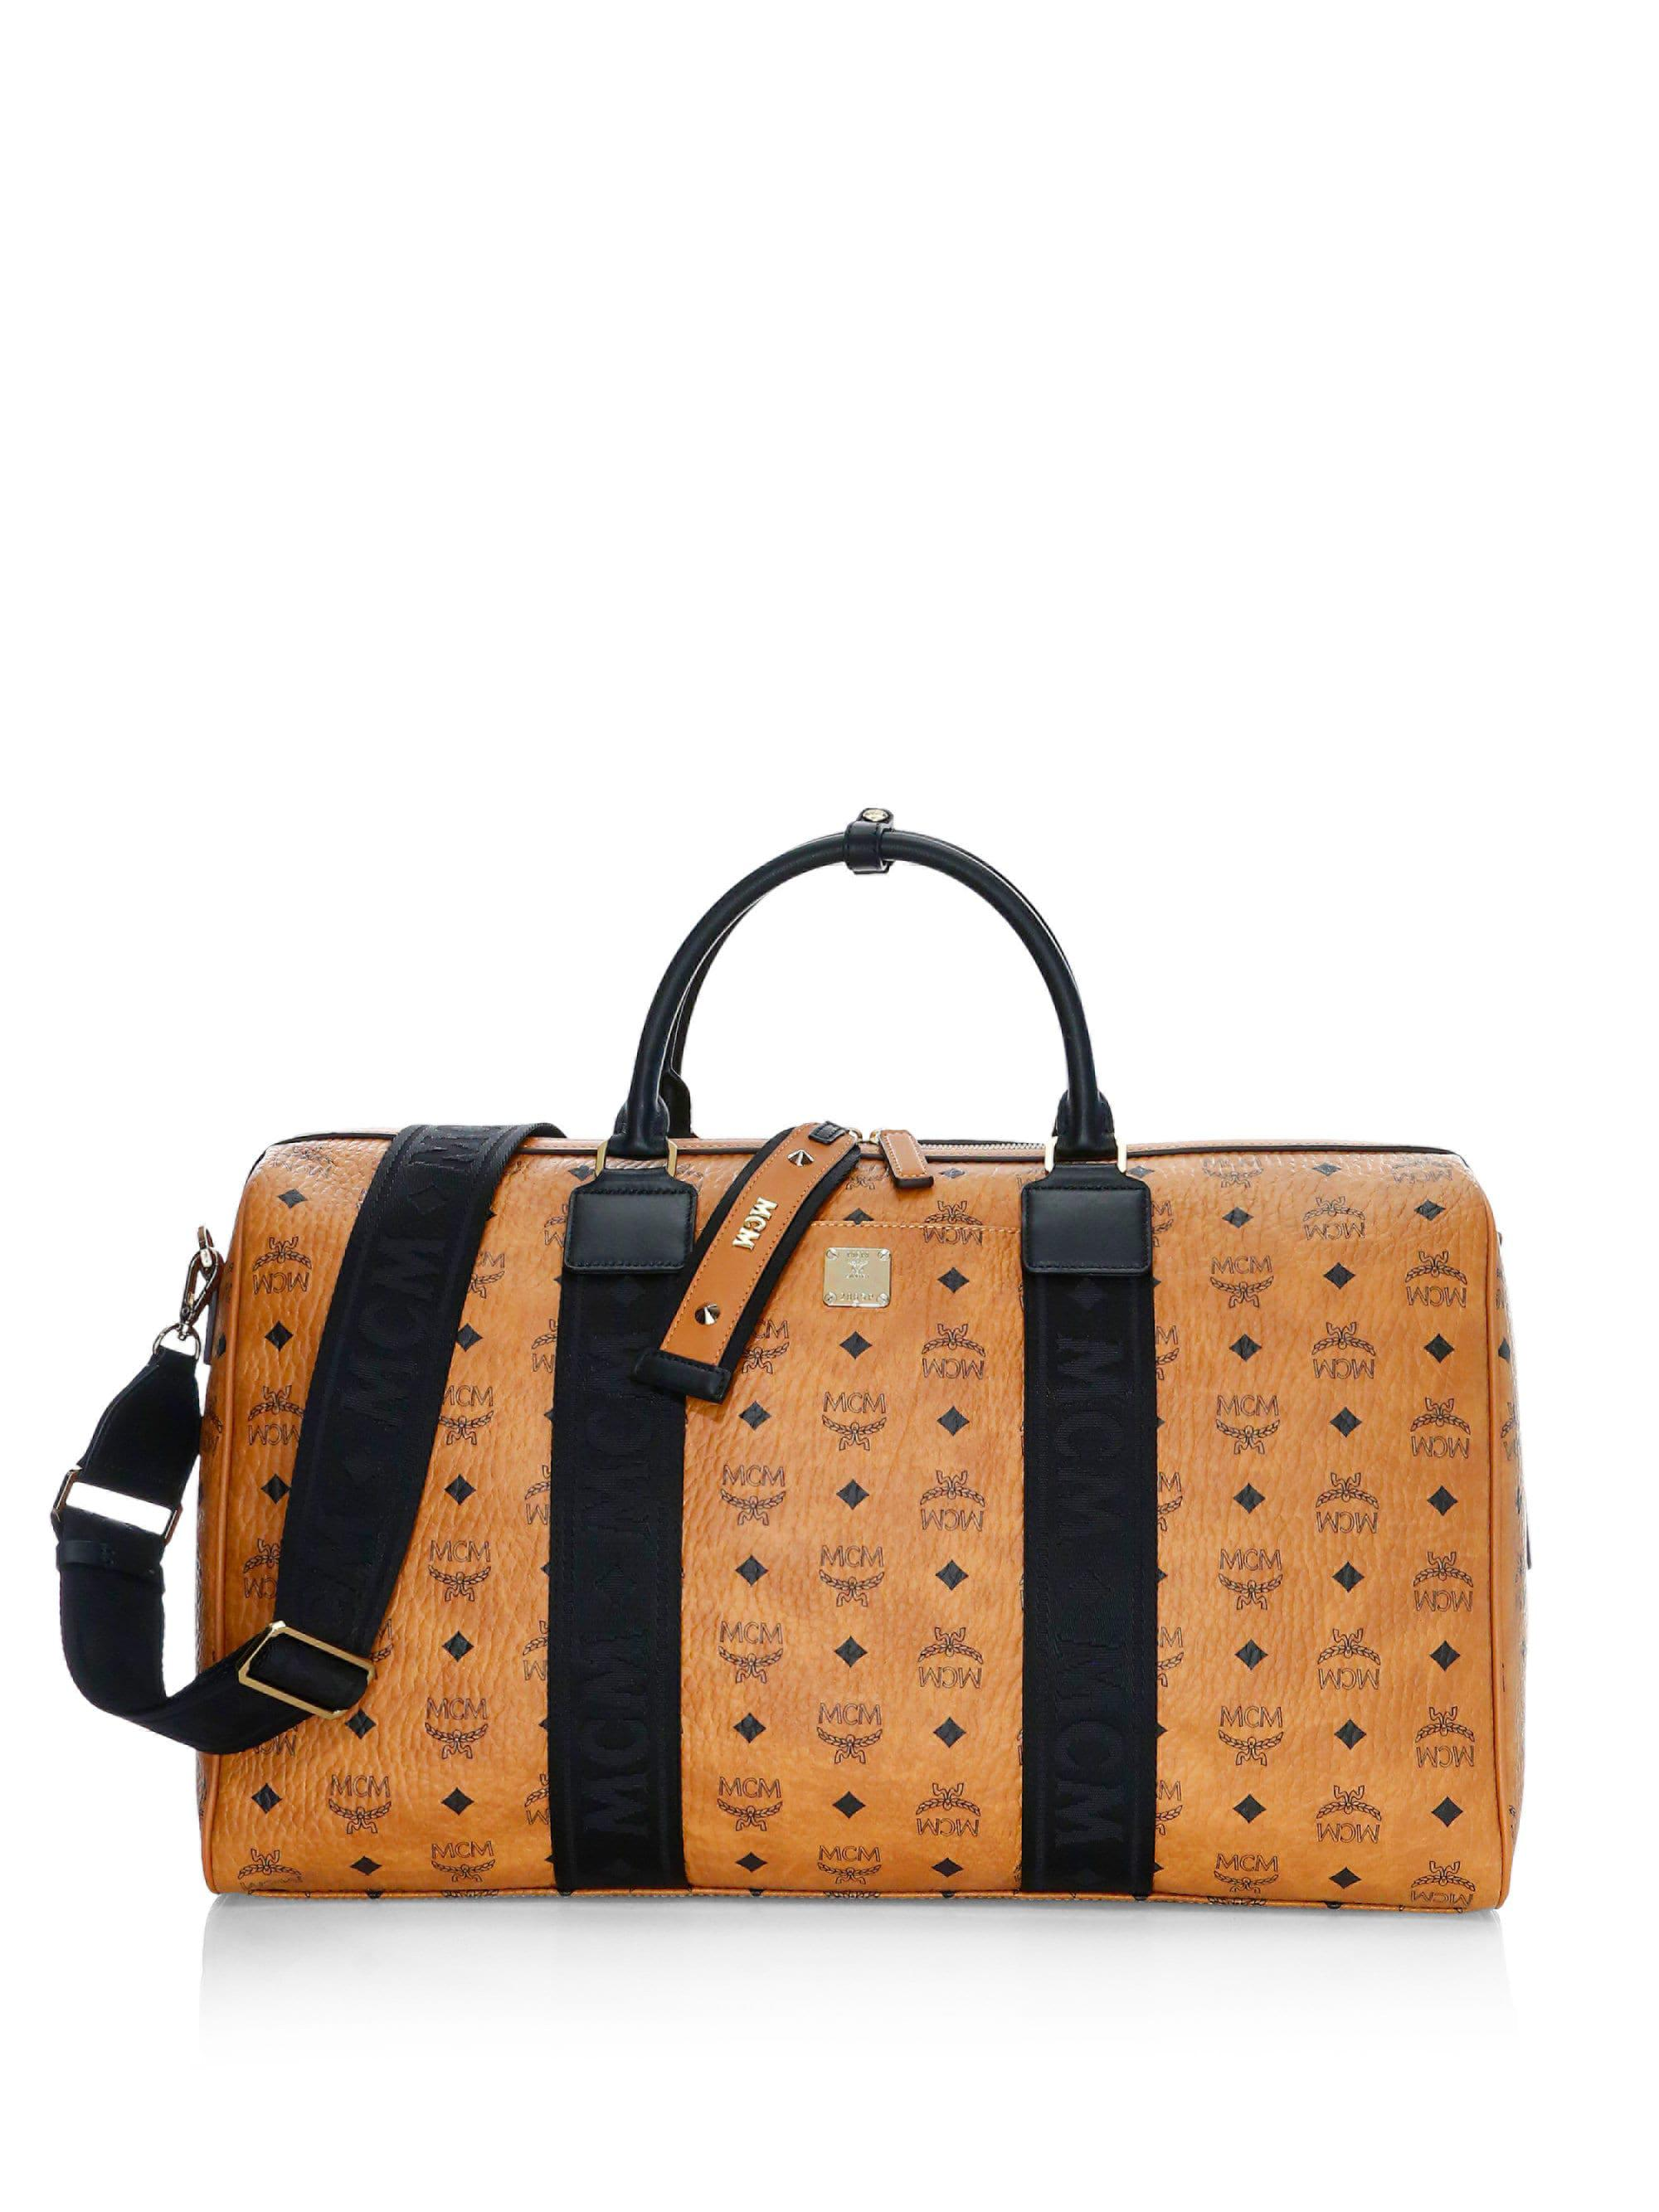 21084e63b6 ... Weekender Visetos Coated Canvas Traveler Duffel Bag for Men - Lyst.  View fullscreen